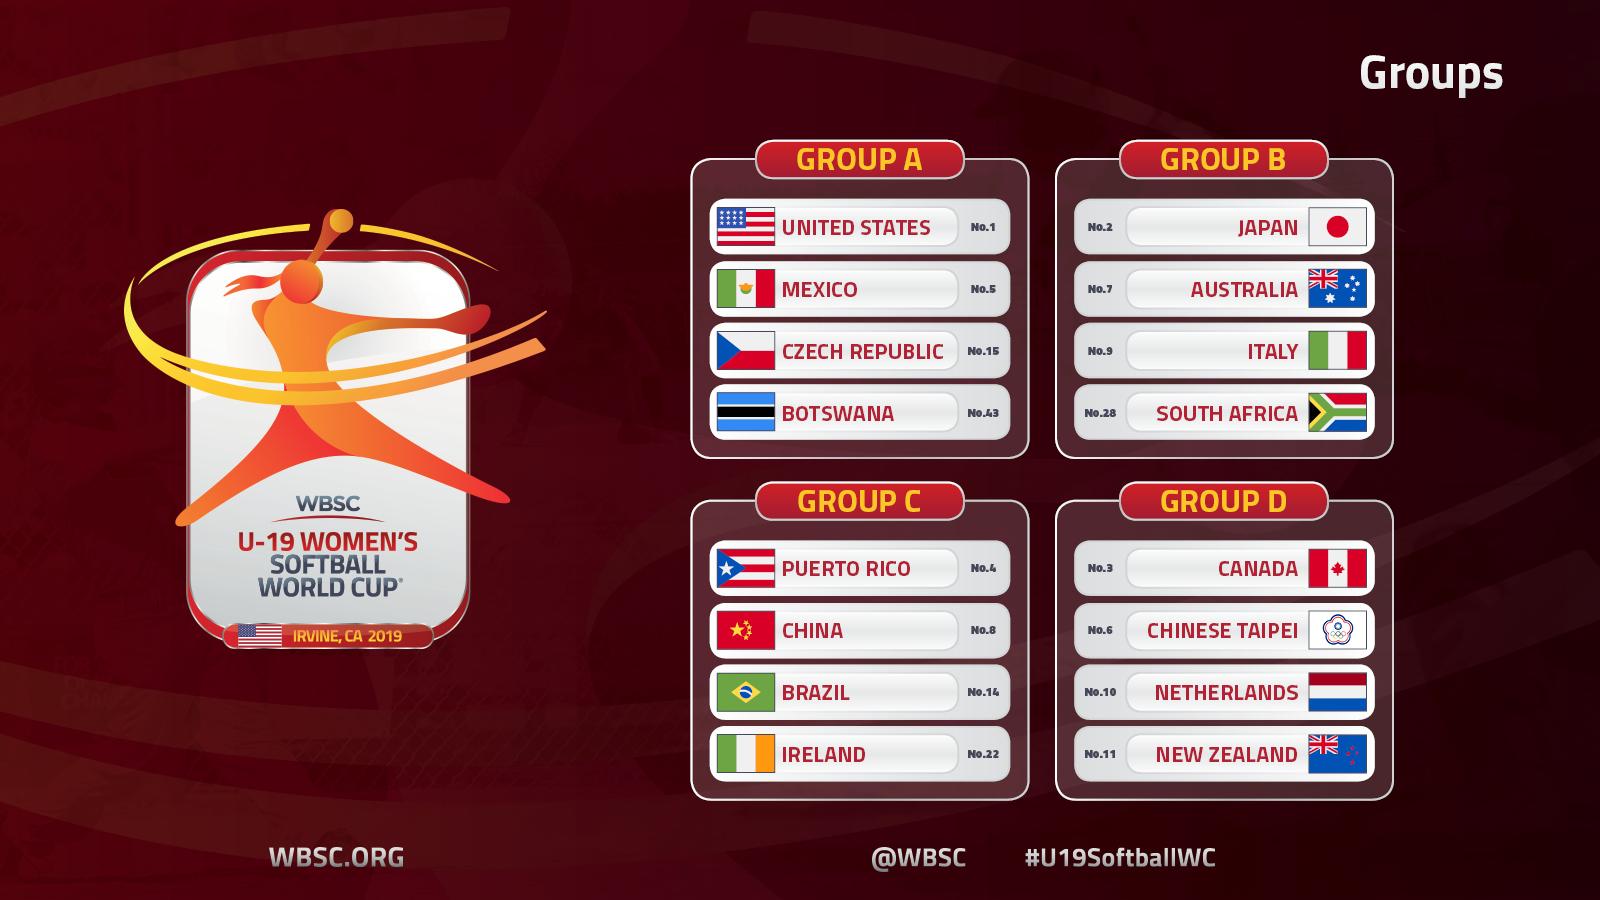 U-19 Women's Softball World Cup groups